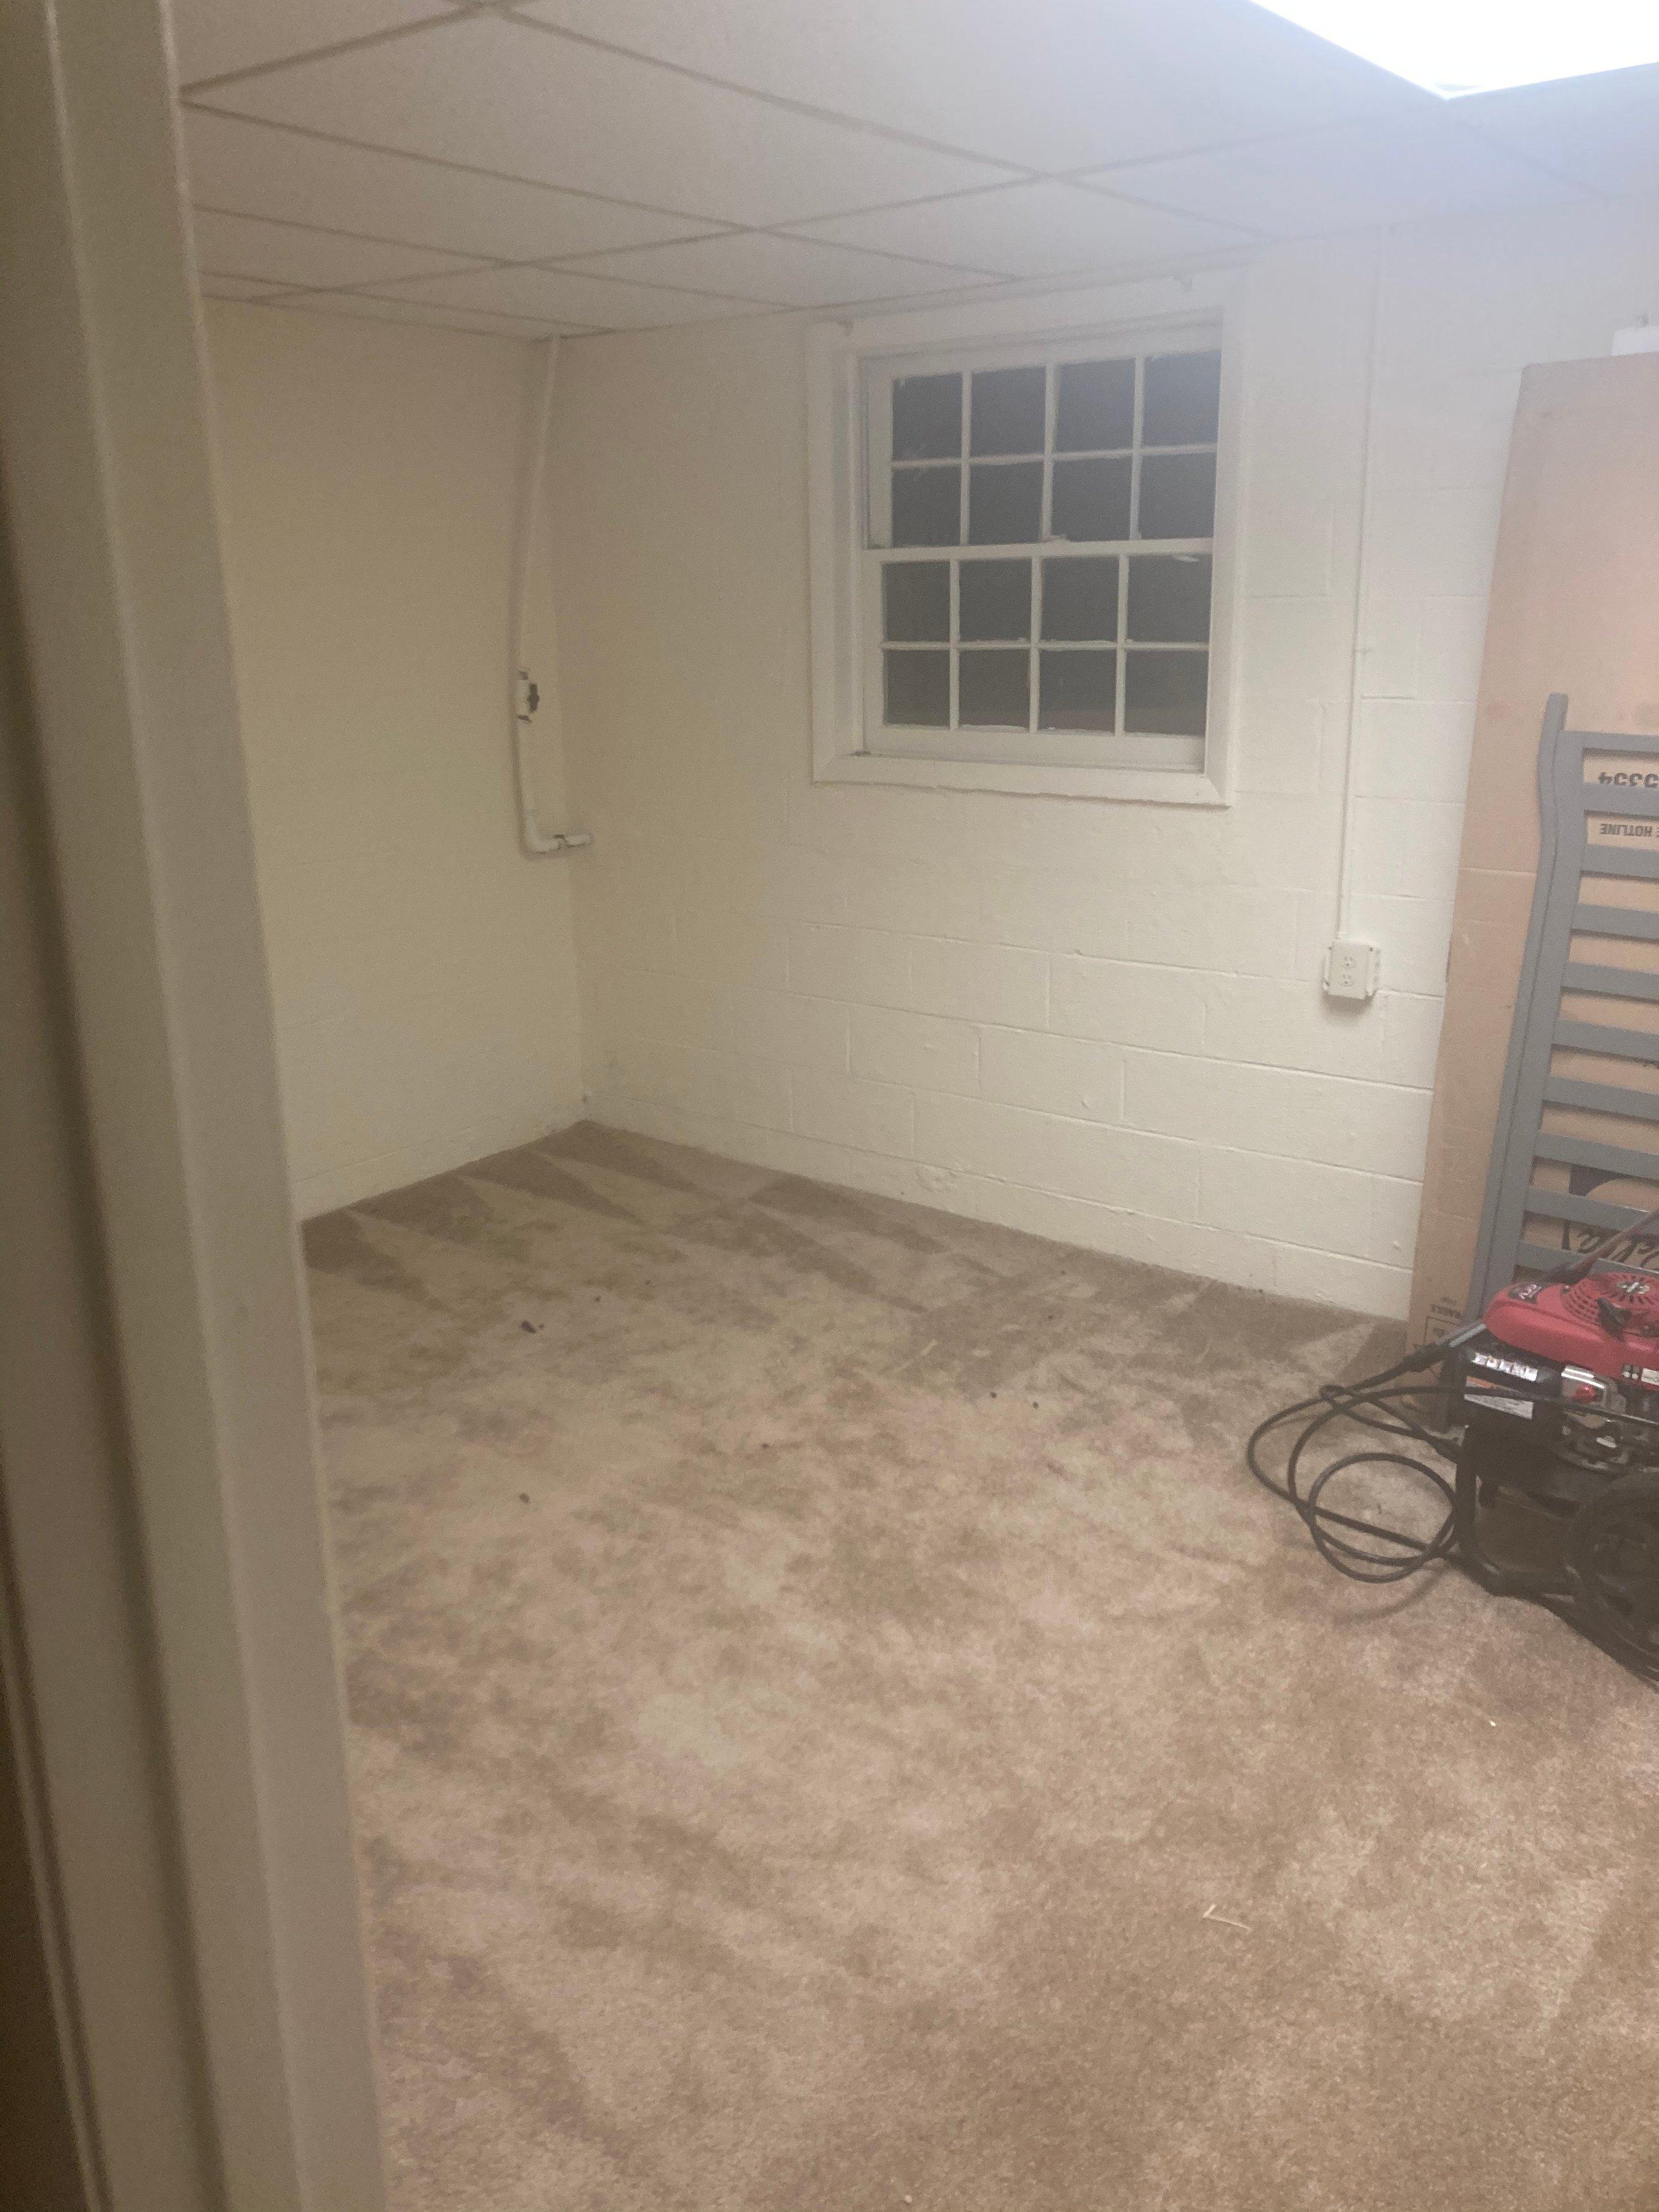 12x18 Basement self storage unit